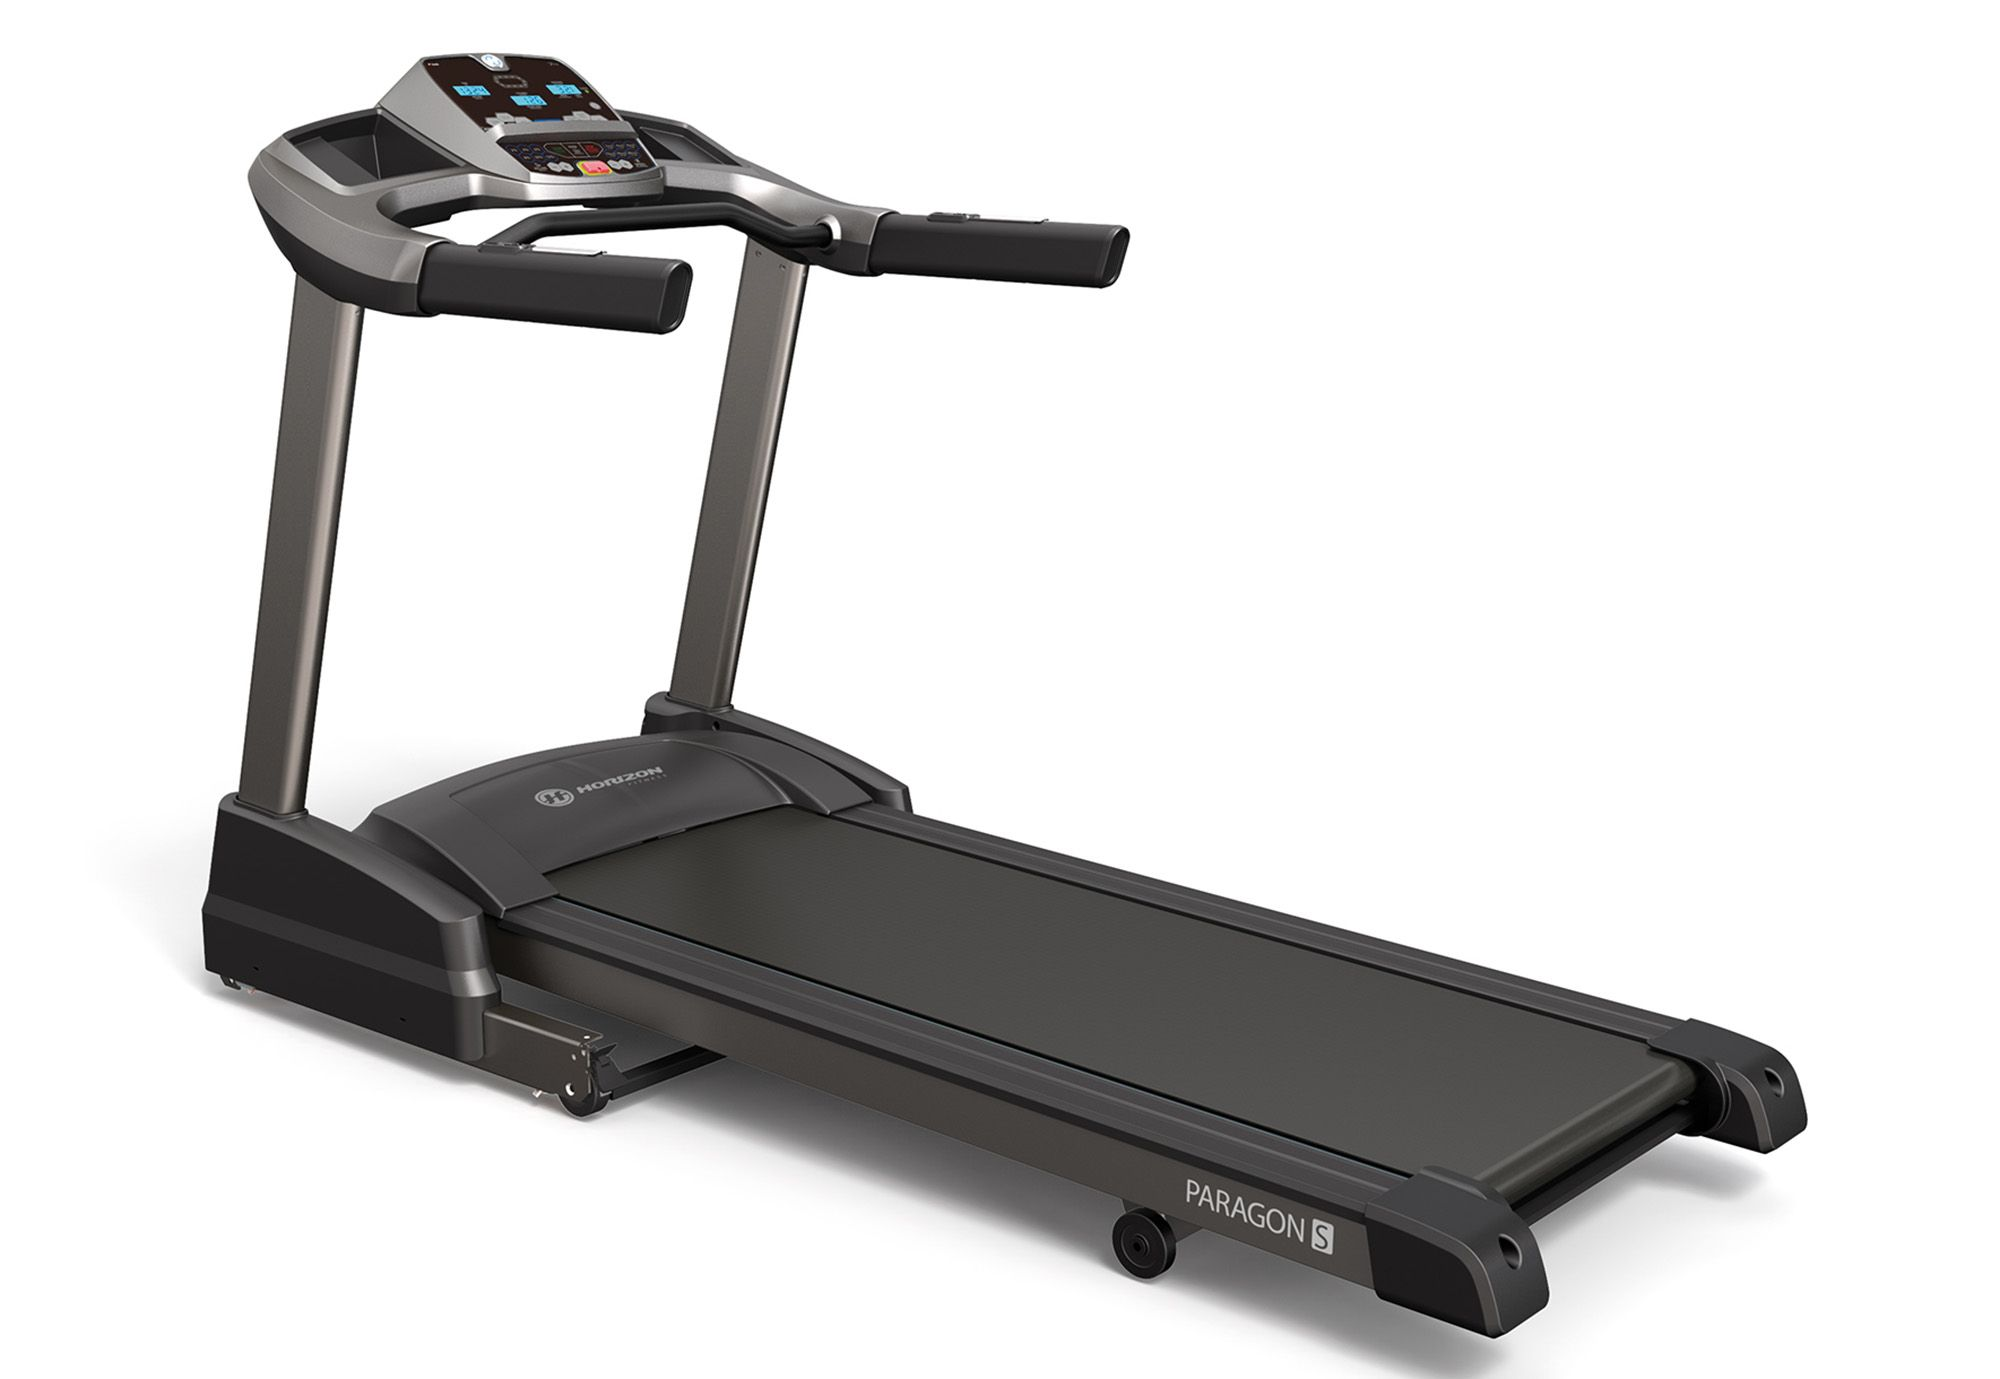 HORIZON FITNESS Laufband, »Paragon 7S«, Horizon Fitness